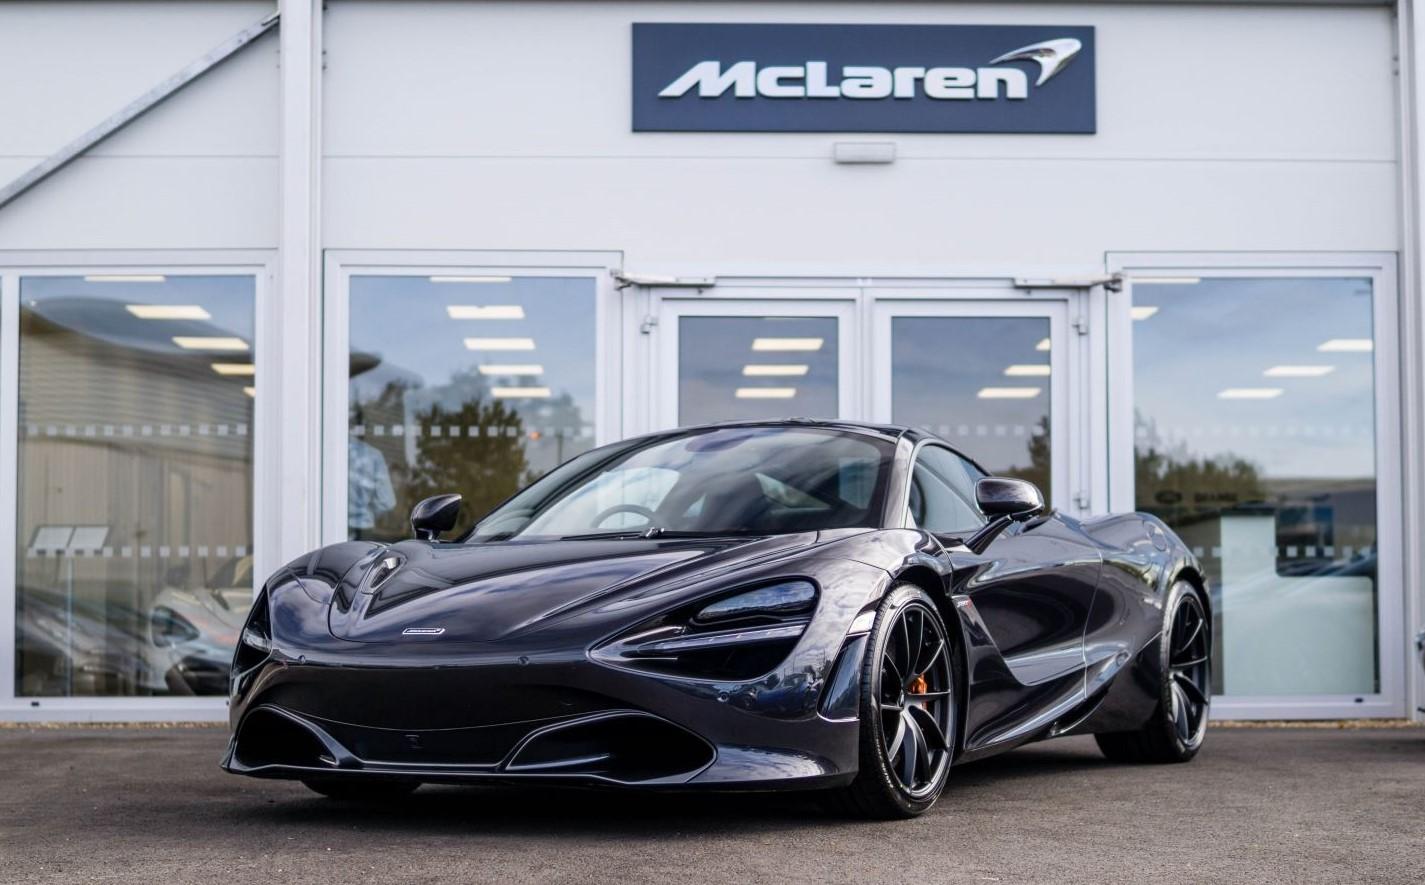 McLaren 720S V8 Performance SSG 4.0 Automatic 2 door Coupe (17MY) image